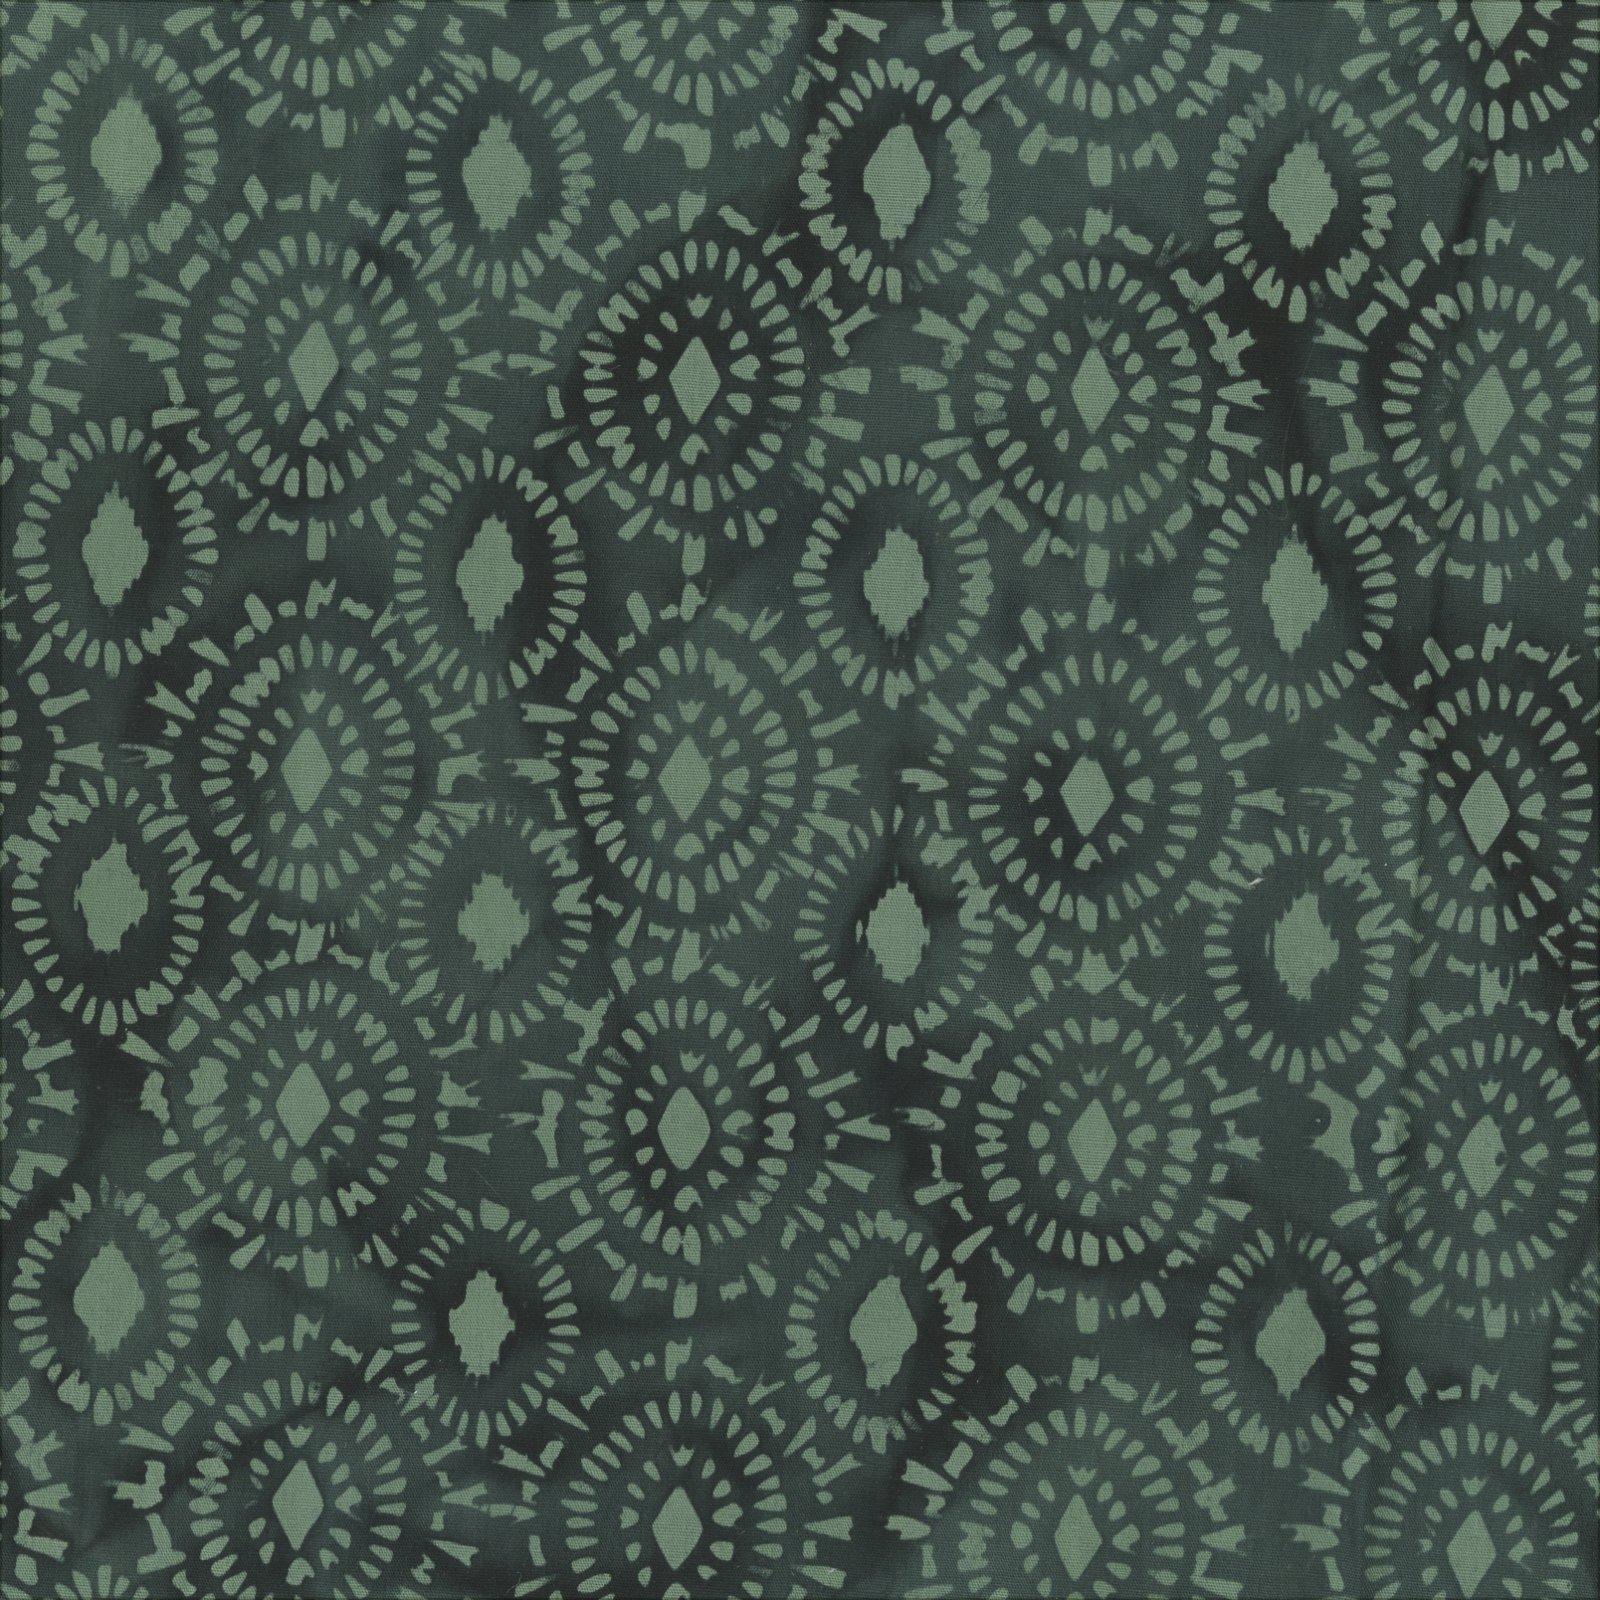 600Q-2 108 Batik Wide Back